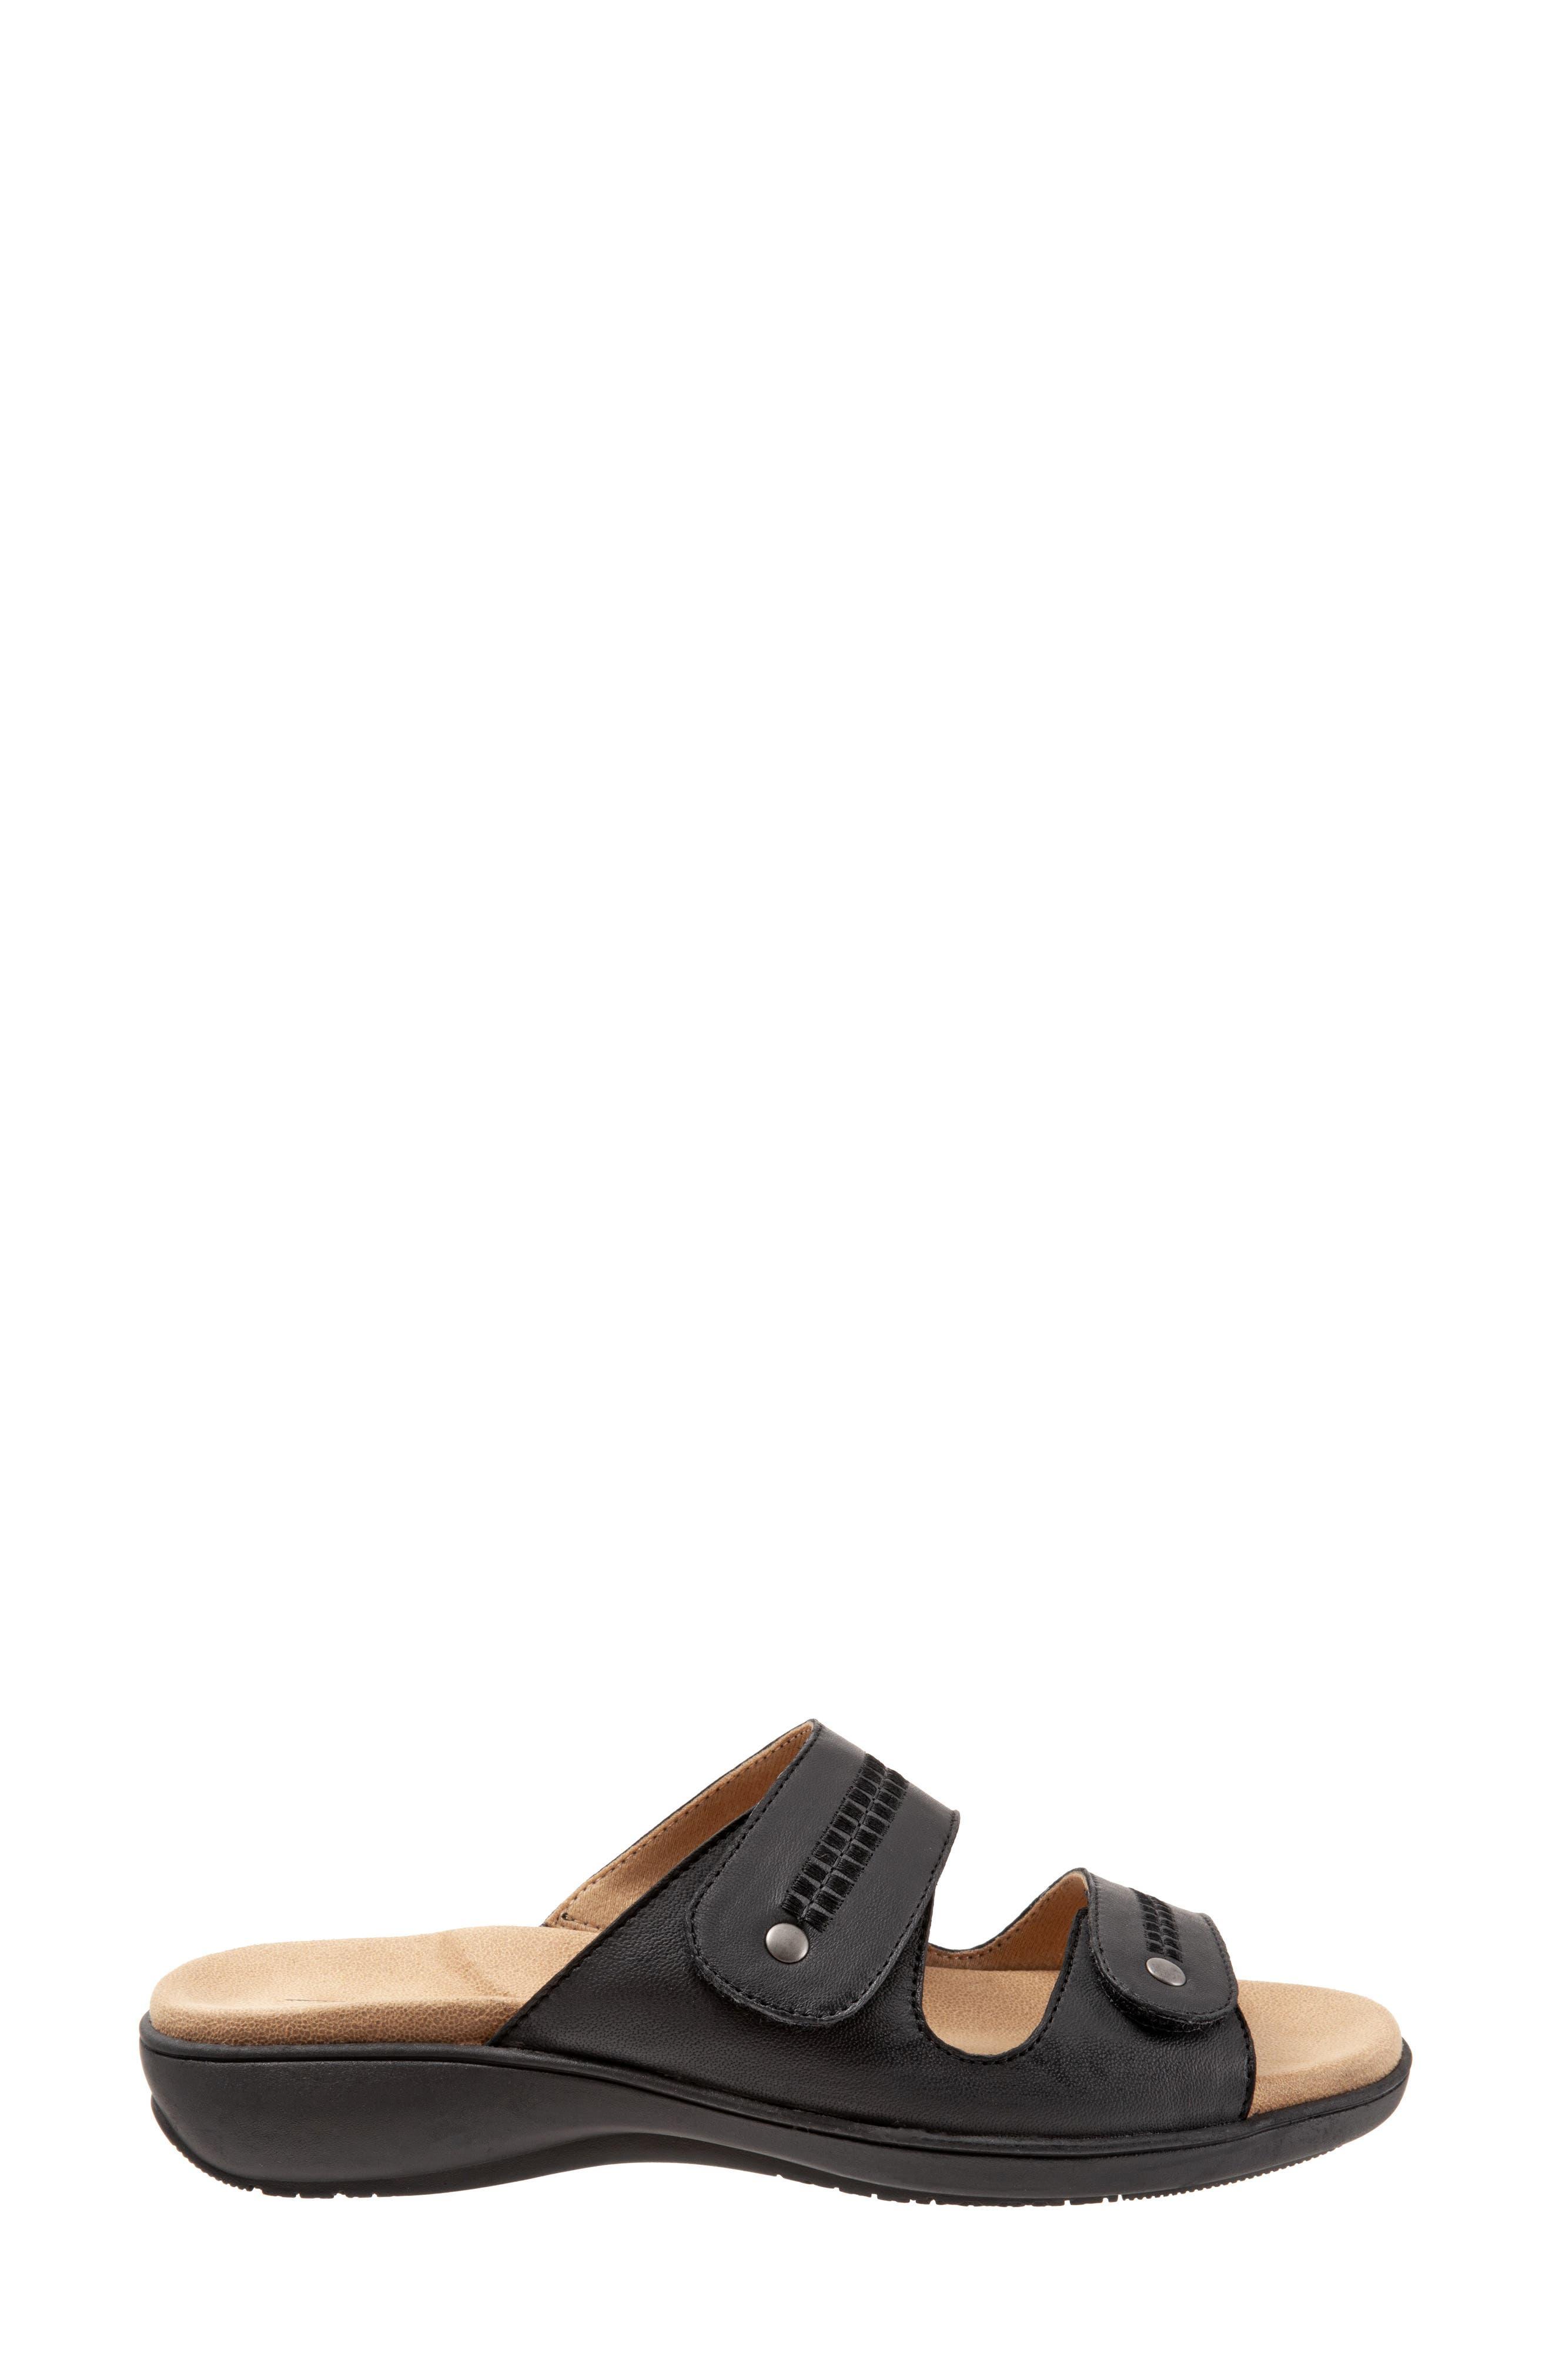 Vale Double Strap Slide Sandal,                             Alternate thumbnail 3, color,                             BLACK LEATHER